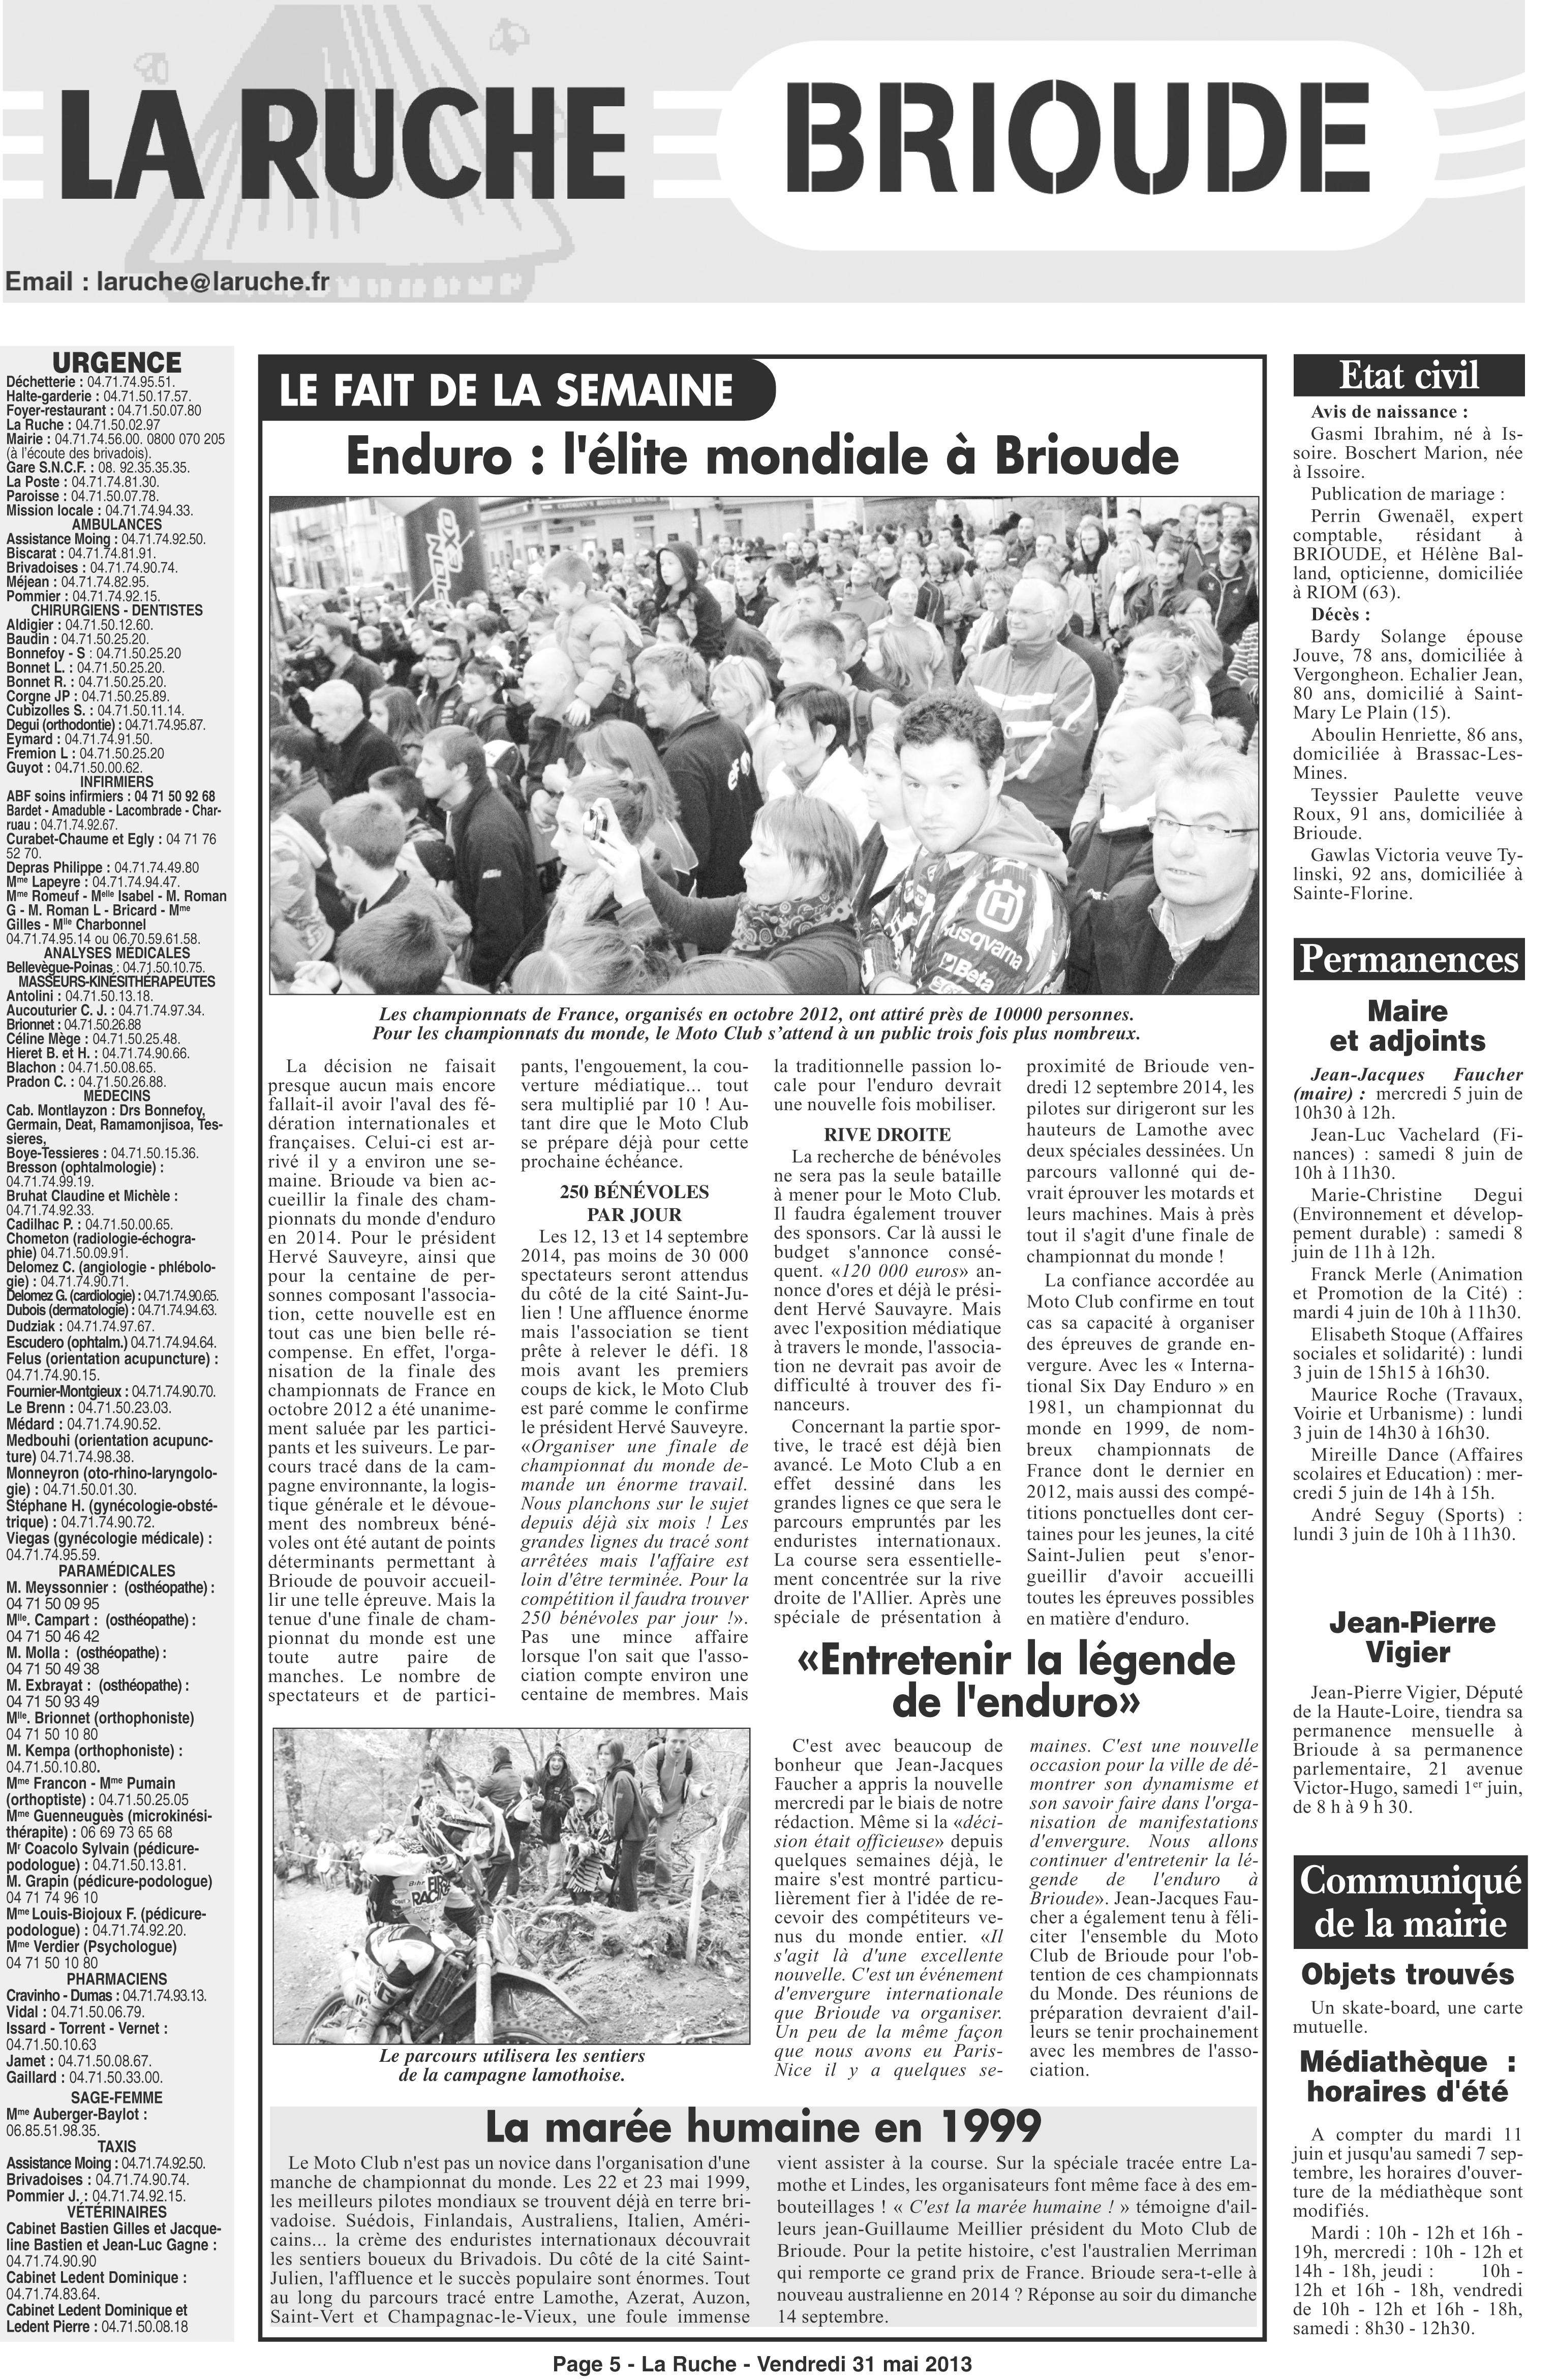 La Ruche 31/05/2013 B